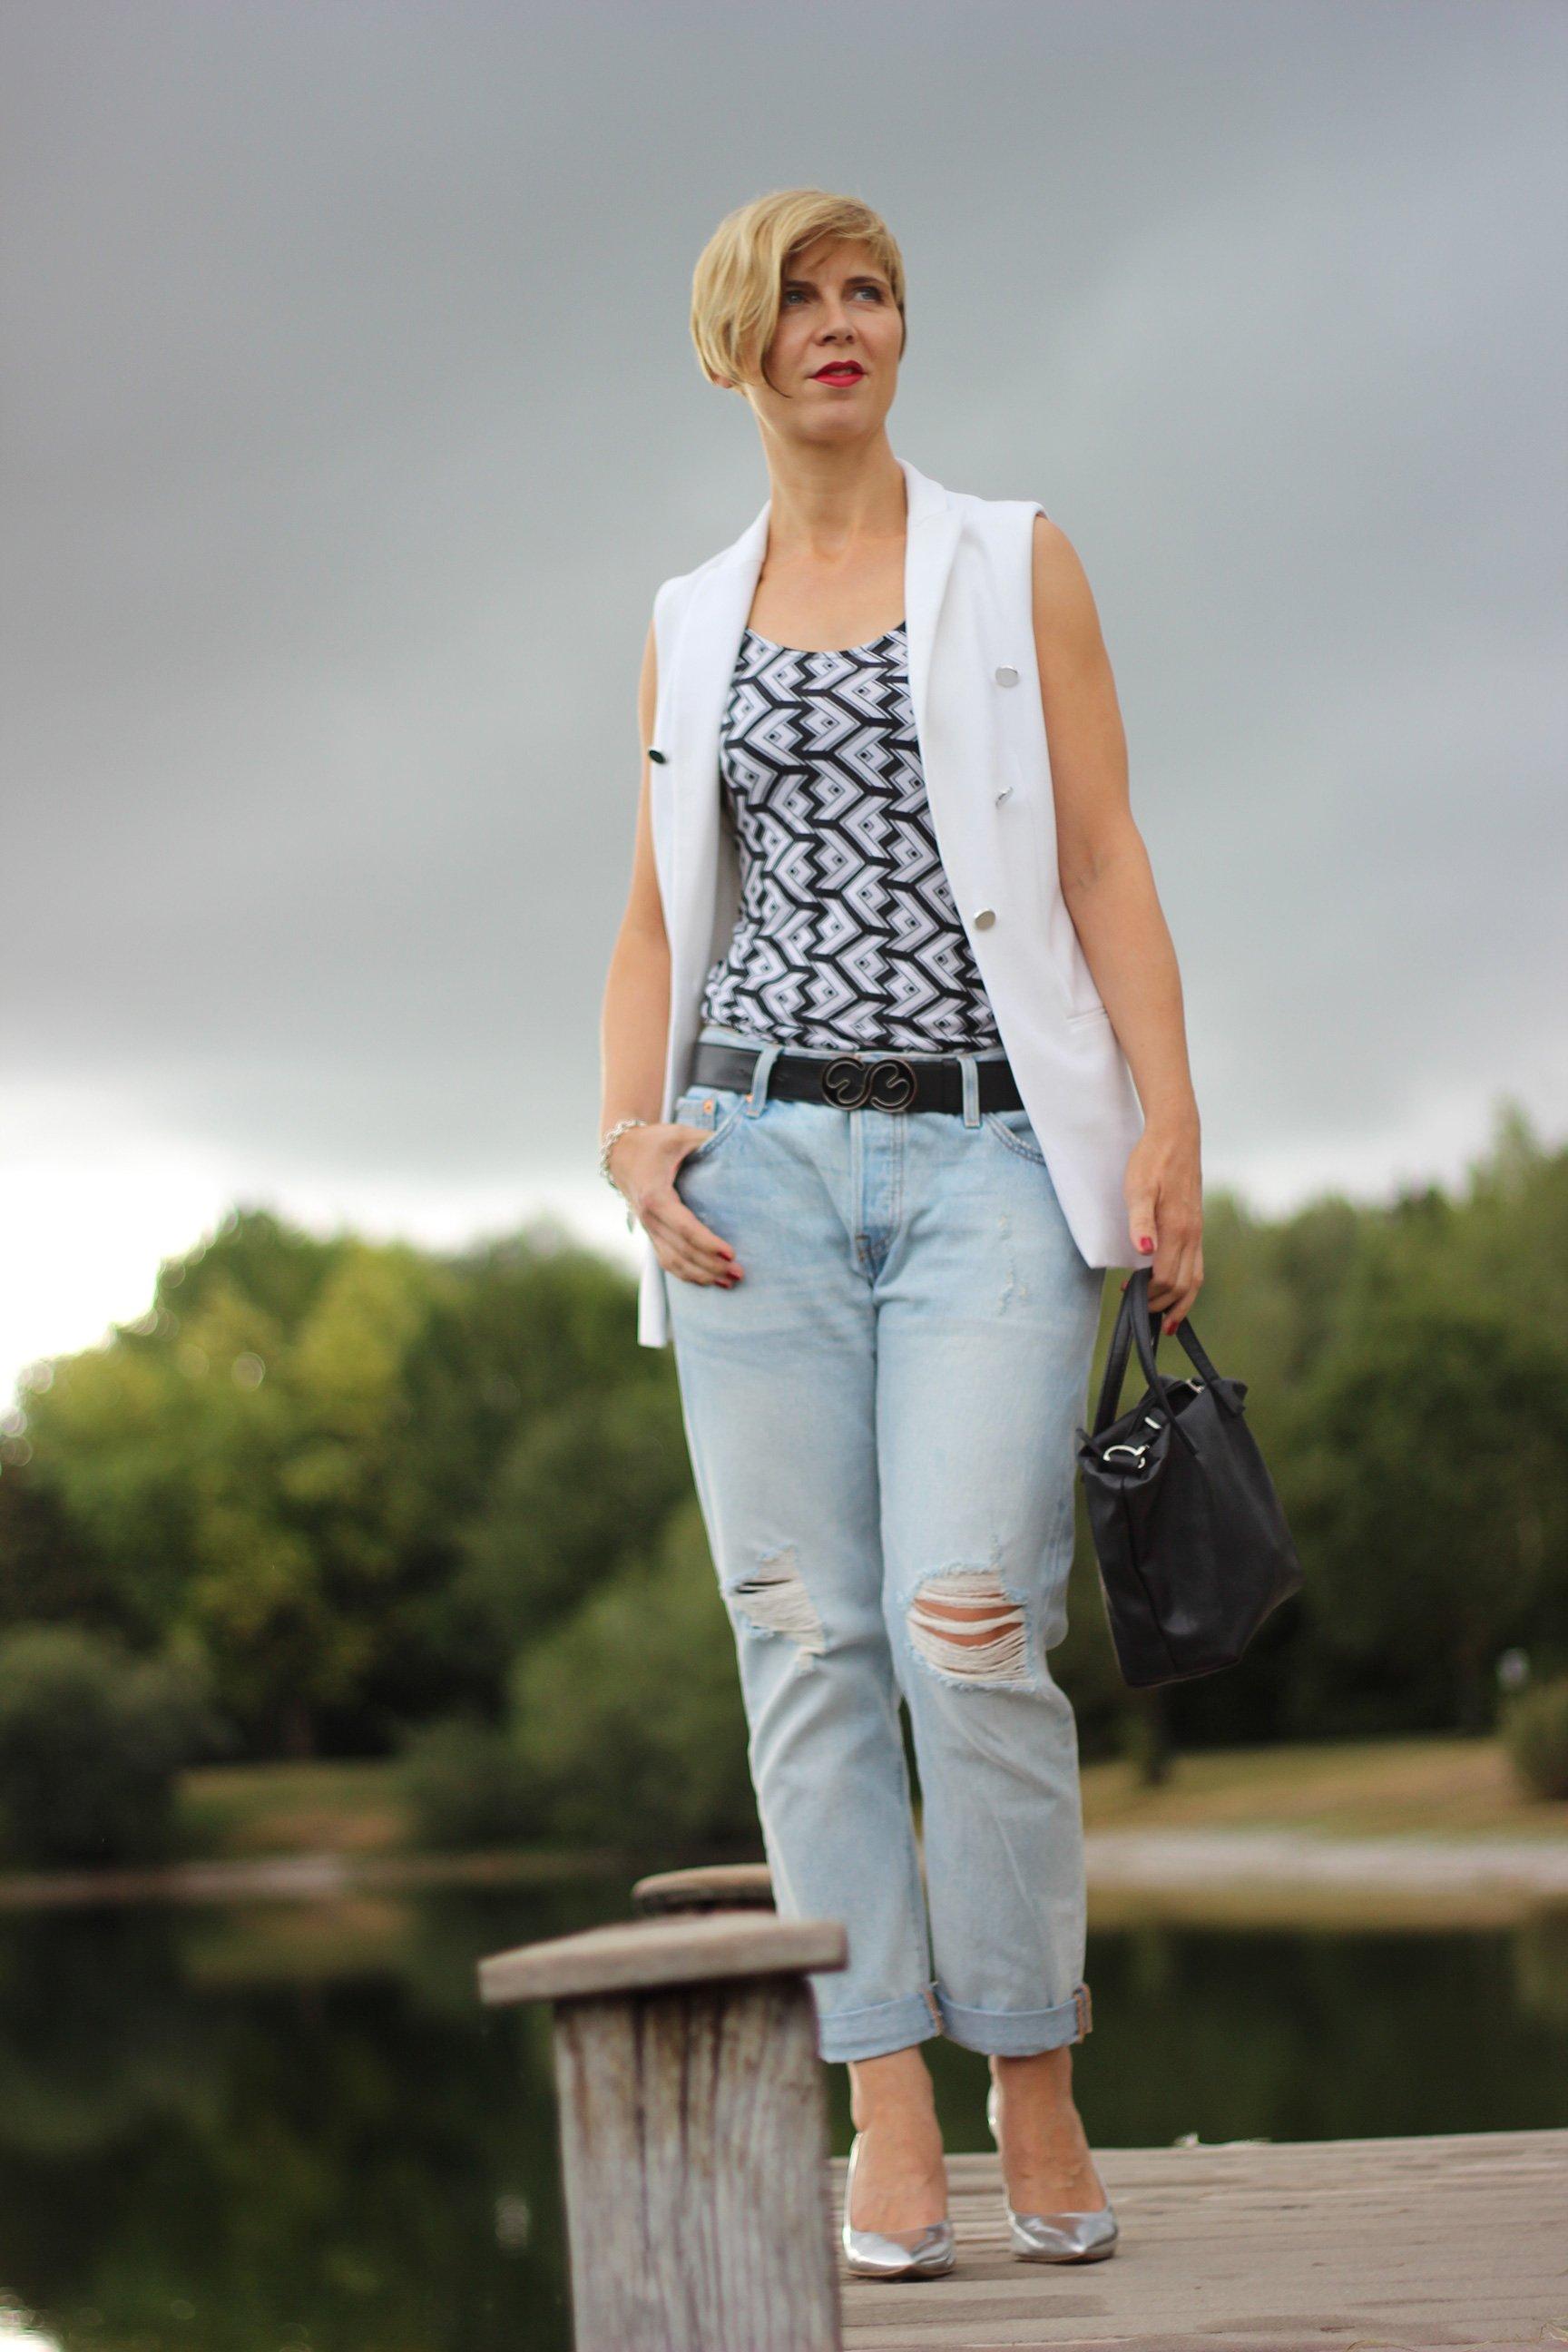 IMG_0477a_Levis501_DestroyedJeans_ü40_fashionblog_oui_weste_MetallicHeels_blackandwhite_schwarz_weiß_Top_casual_Ahemadundahos